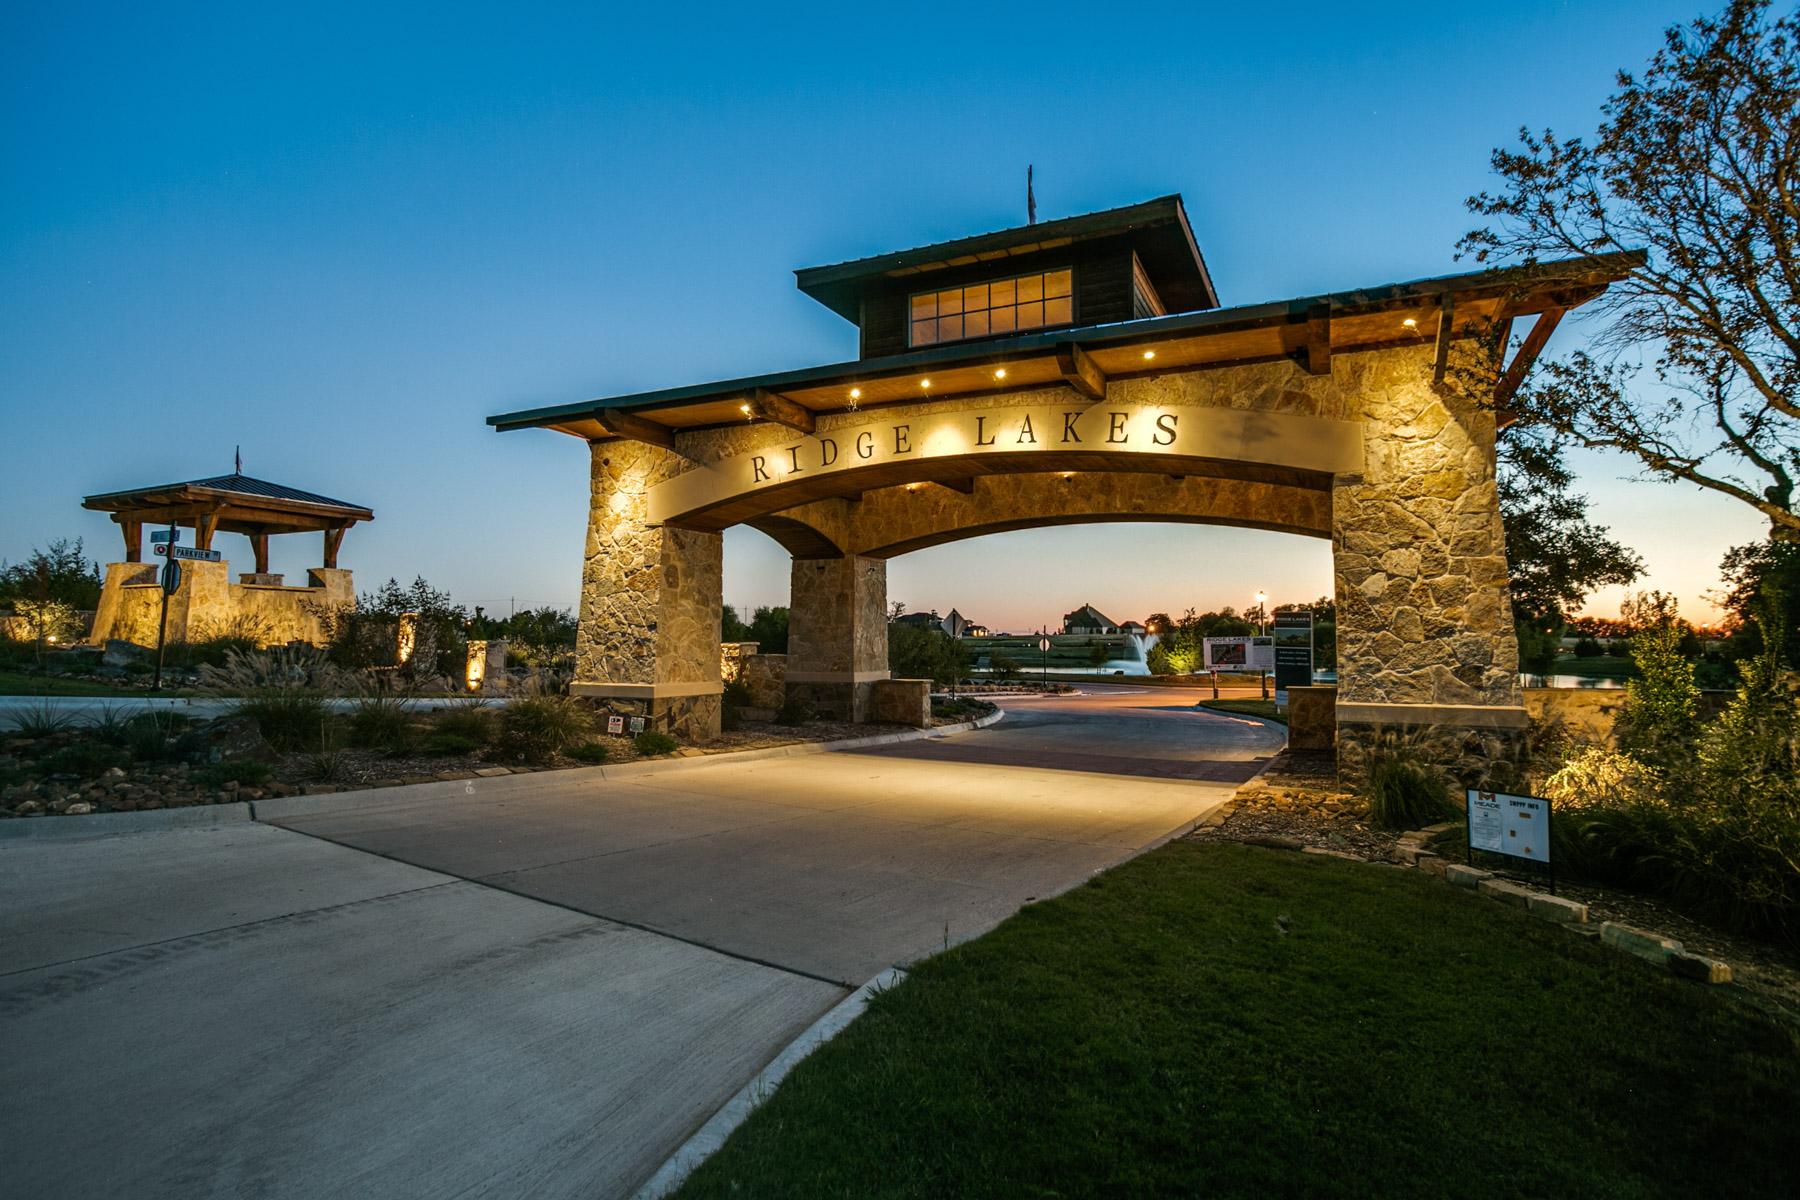 Land for Active at Half Acre Lot in Ridge Lakes of Heath 605 Rustic Ridge Drive Heath, Texas 75032 United States